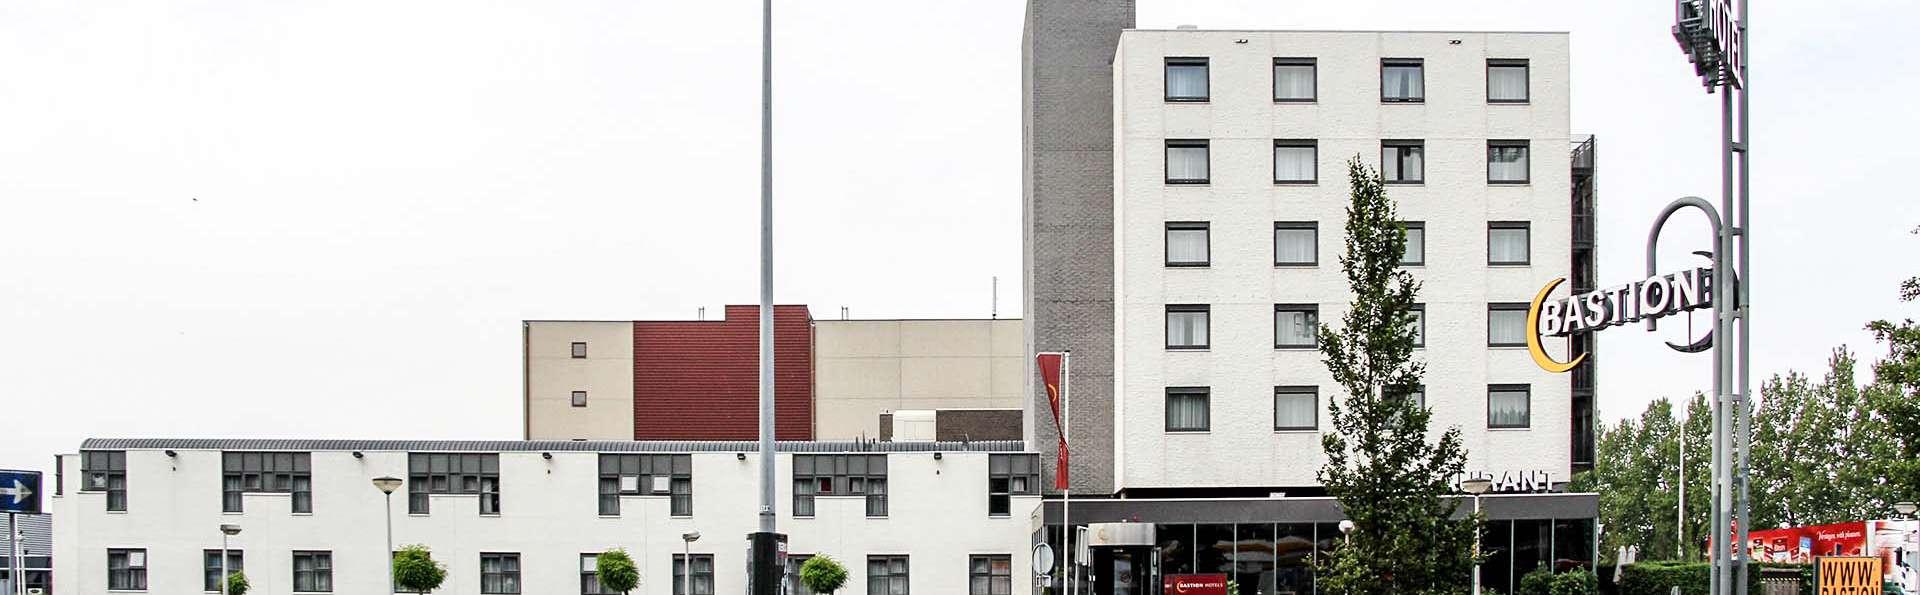 Bastion Hotel Zaandam - EDIT_Bastion-Hotel-Zaandam_01.jpg